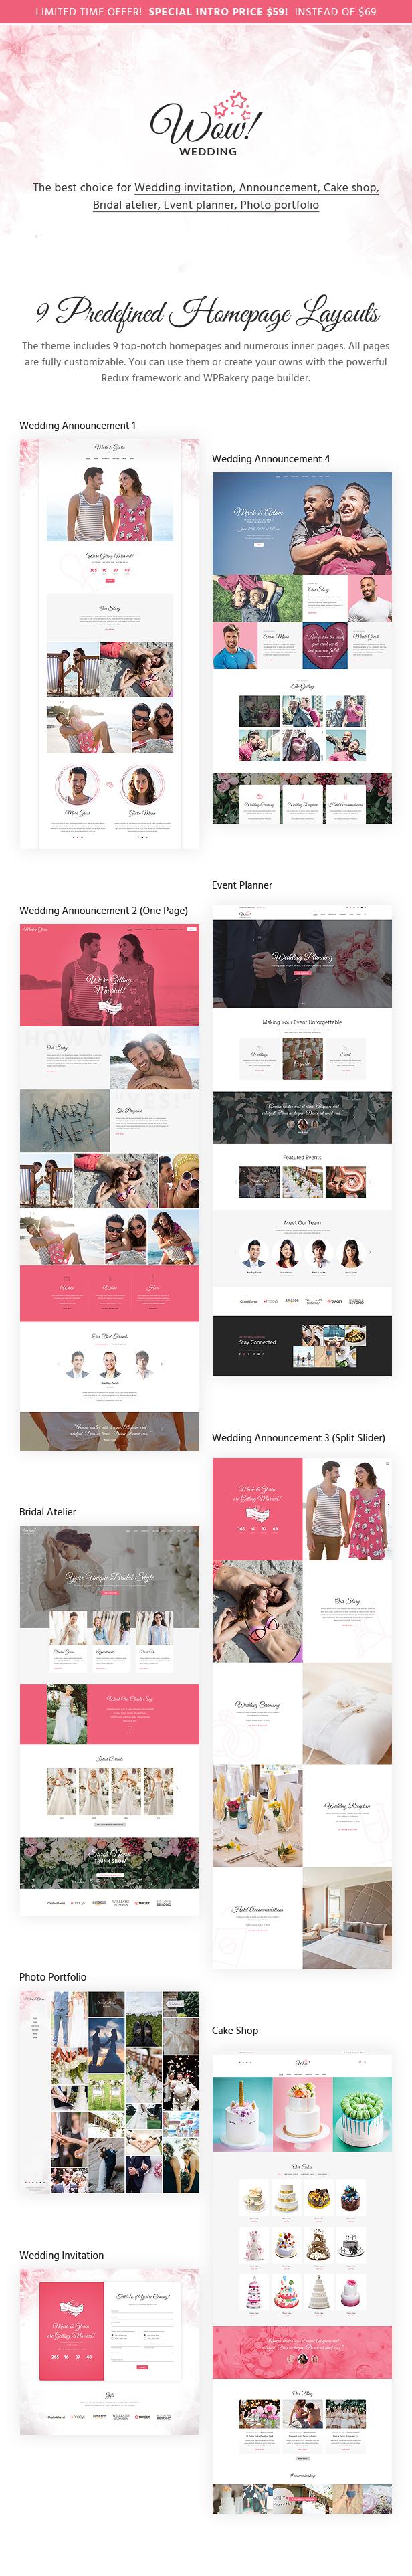 WoWedding - Wedding Oriented WordPress Theme - 1